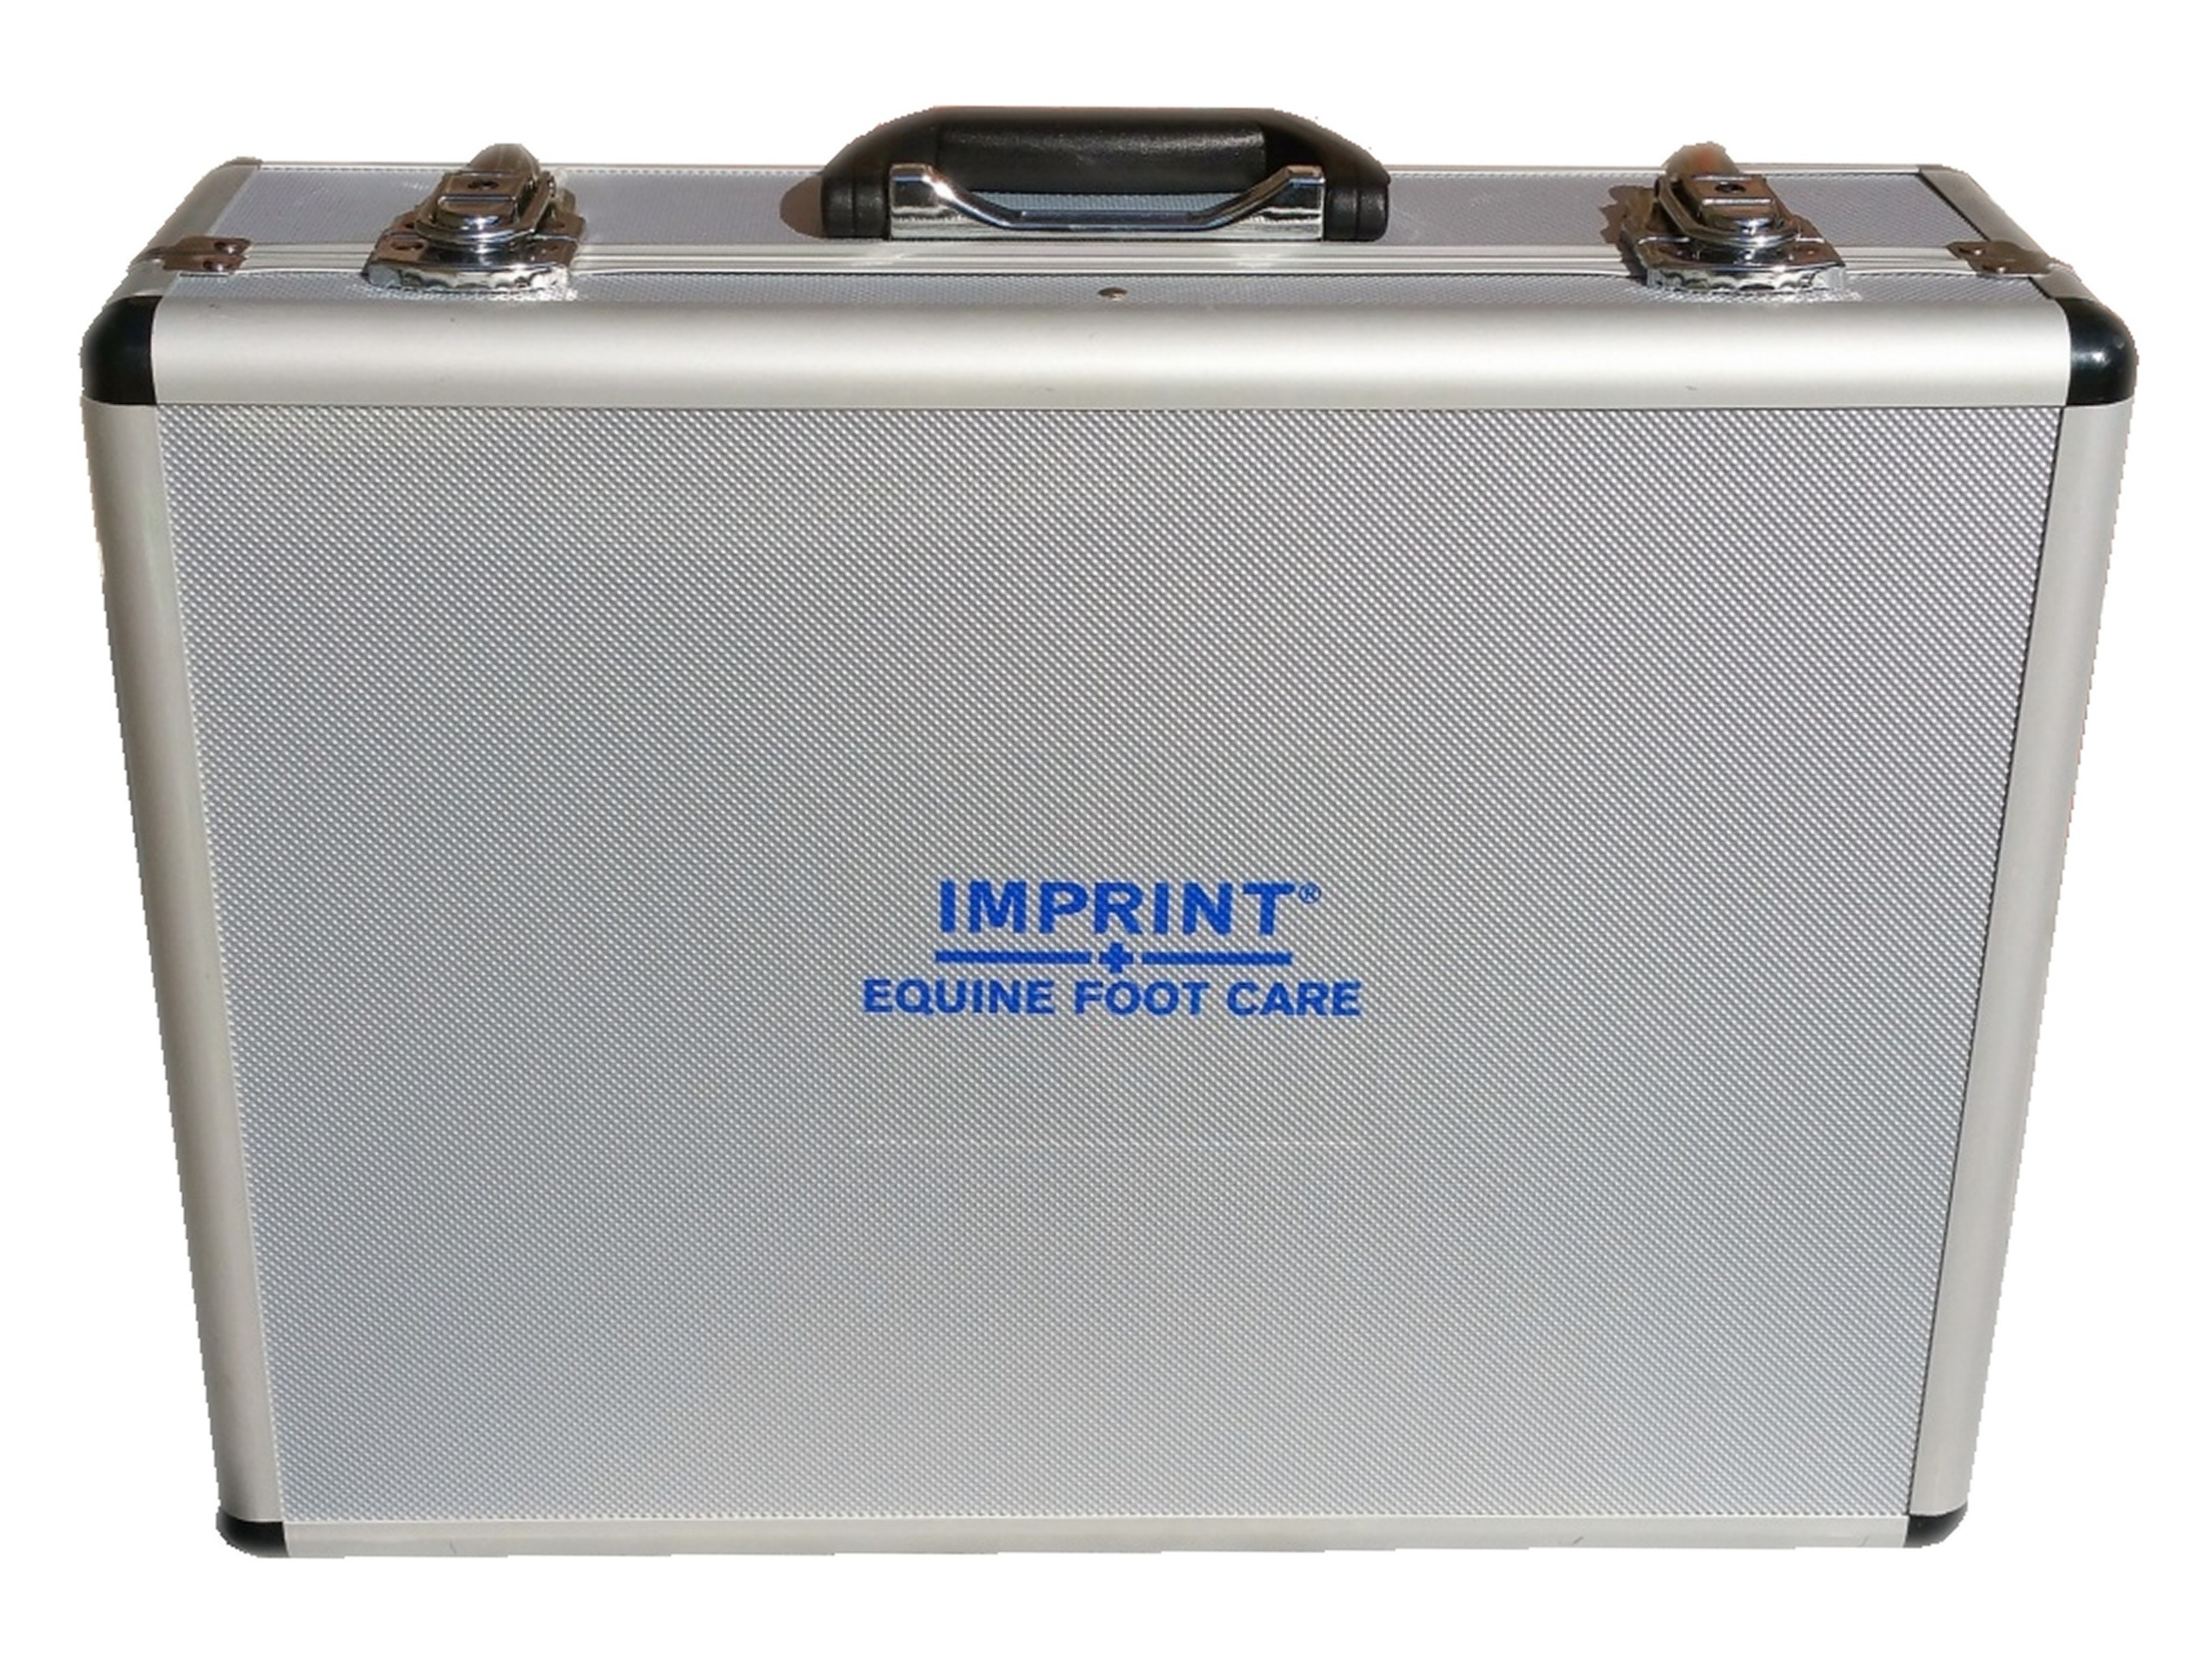 Imprint Case